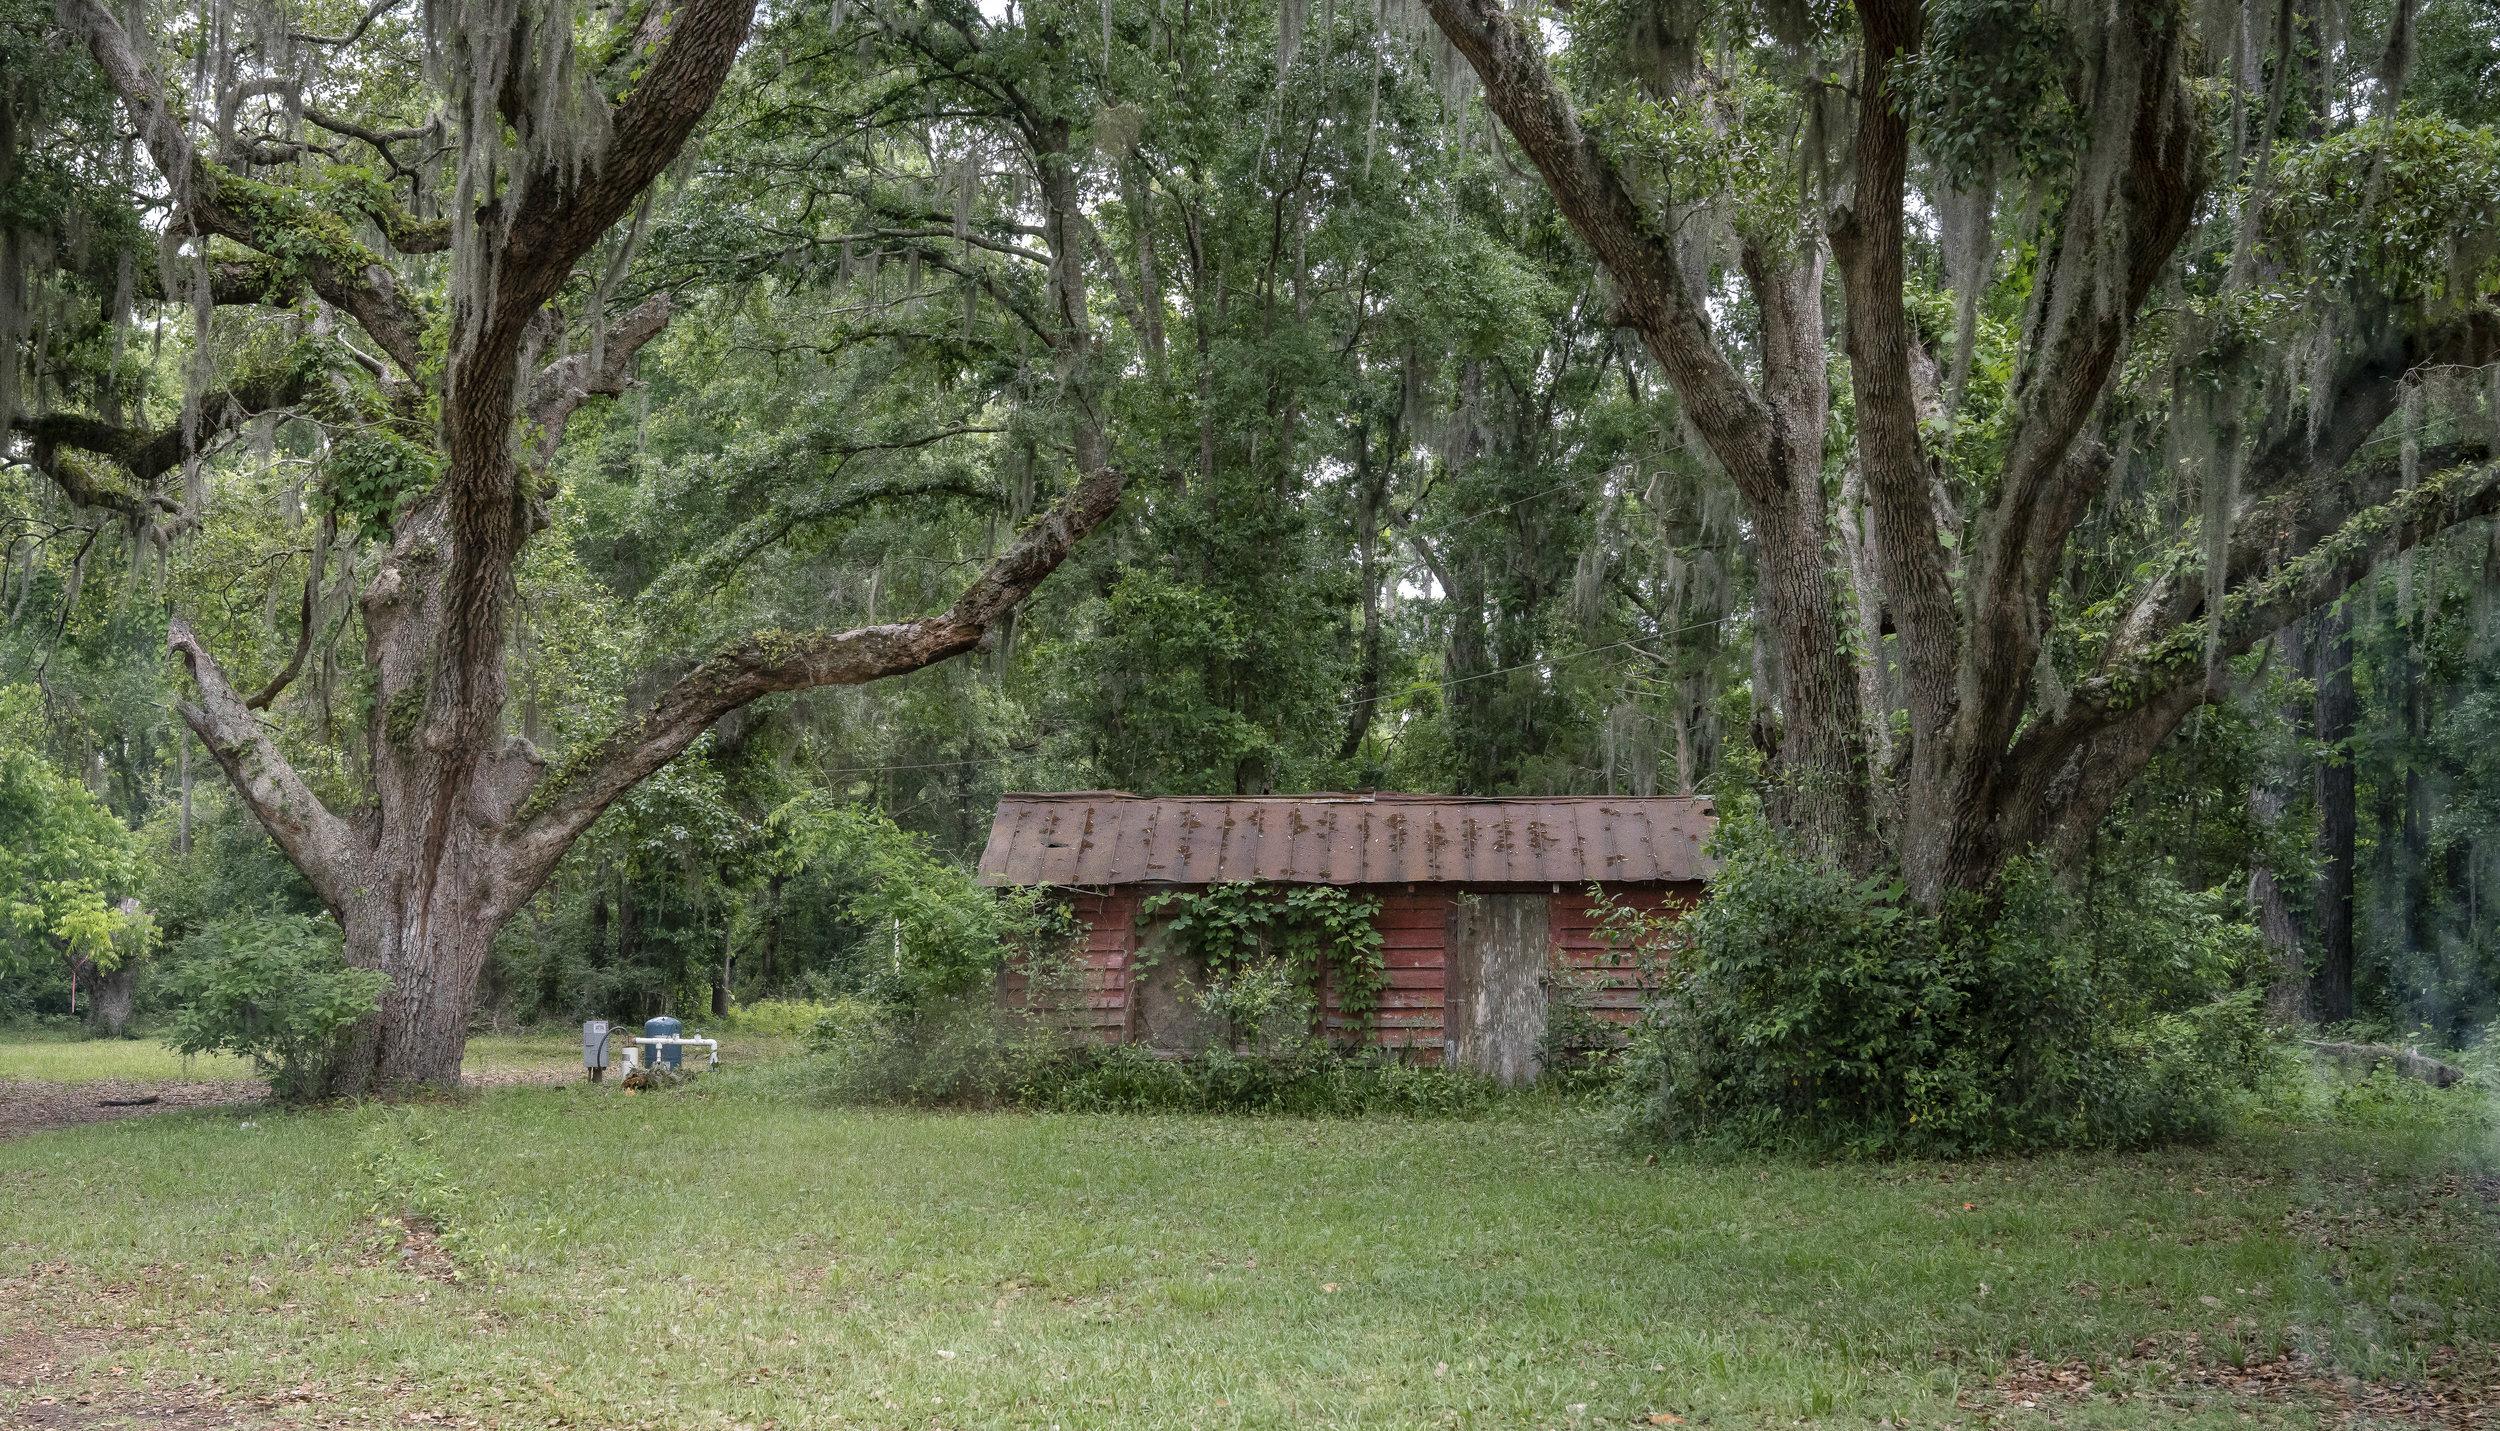 Abandoned Gullah home nestled in the trees.